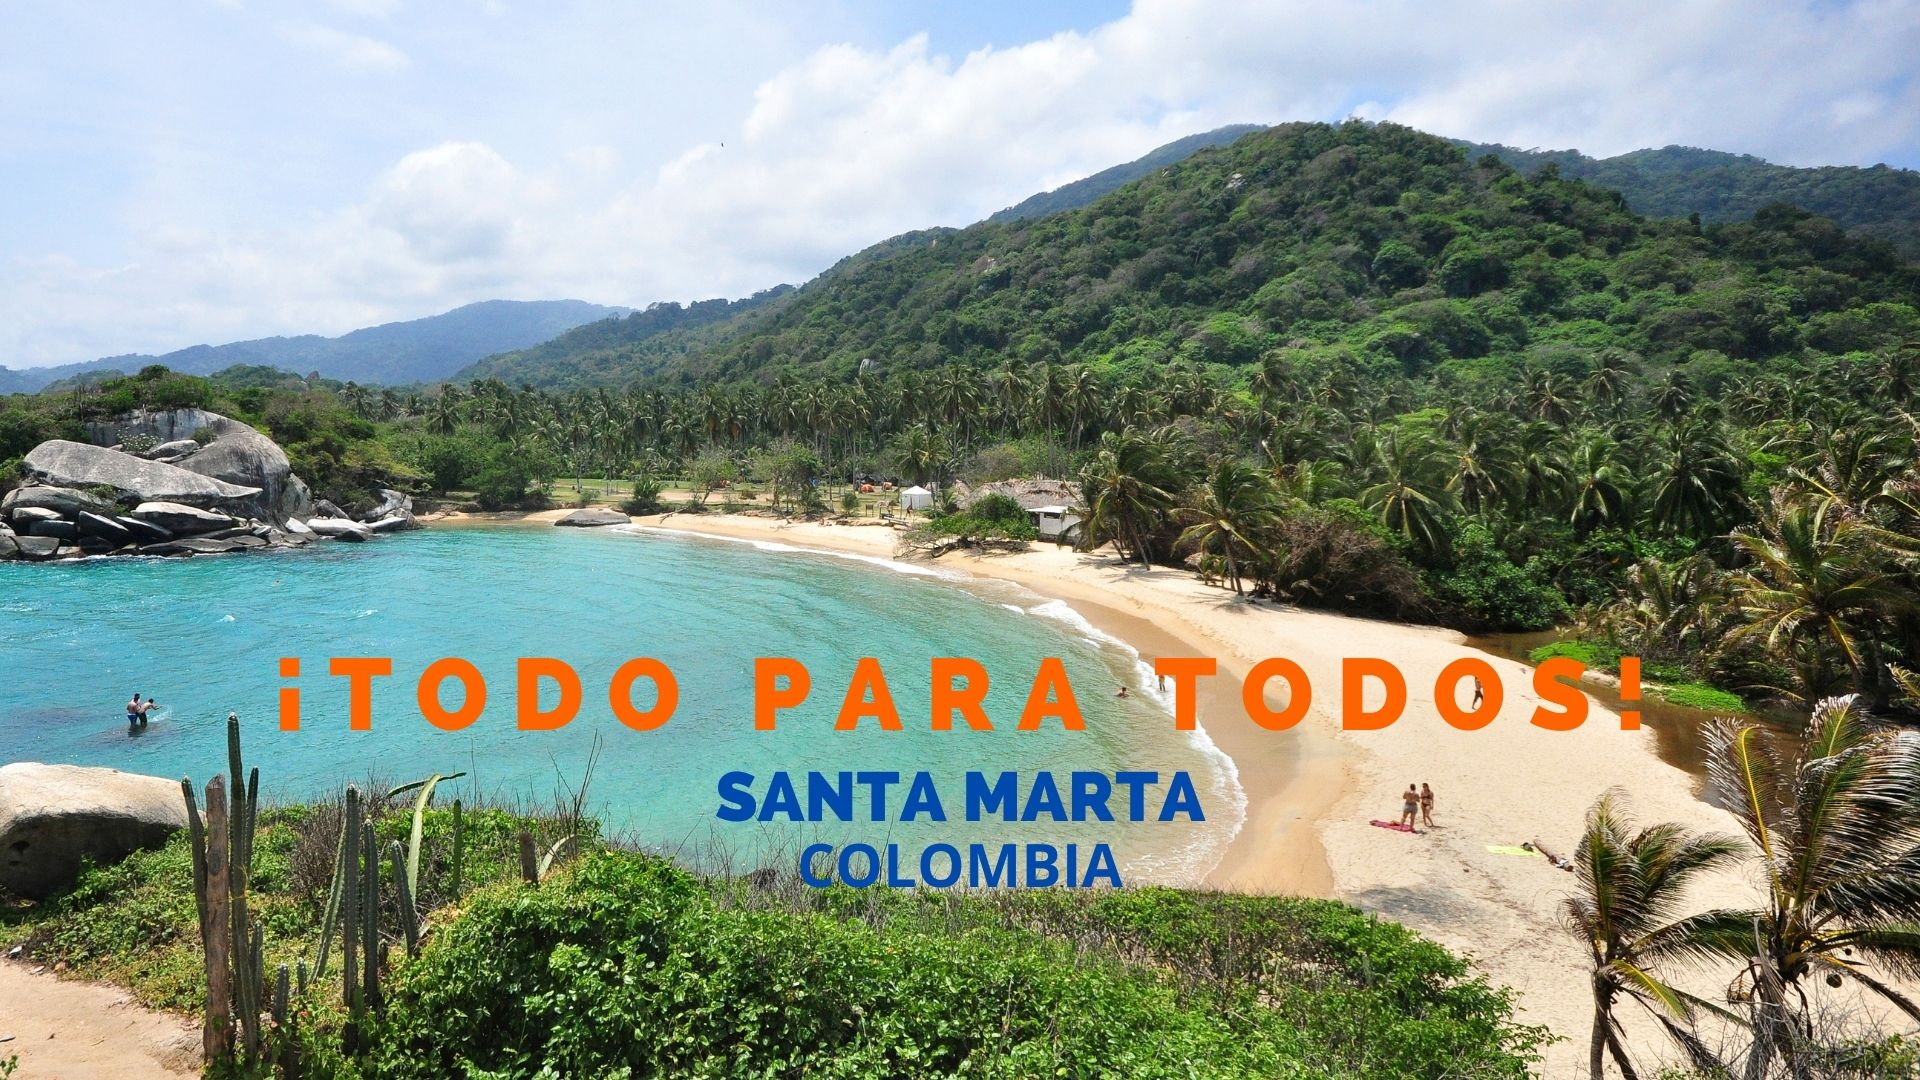 Santa Marta, Ciénaga, Magdalena, Colombia- Caribe